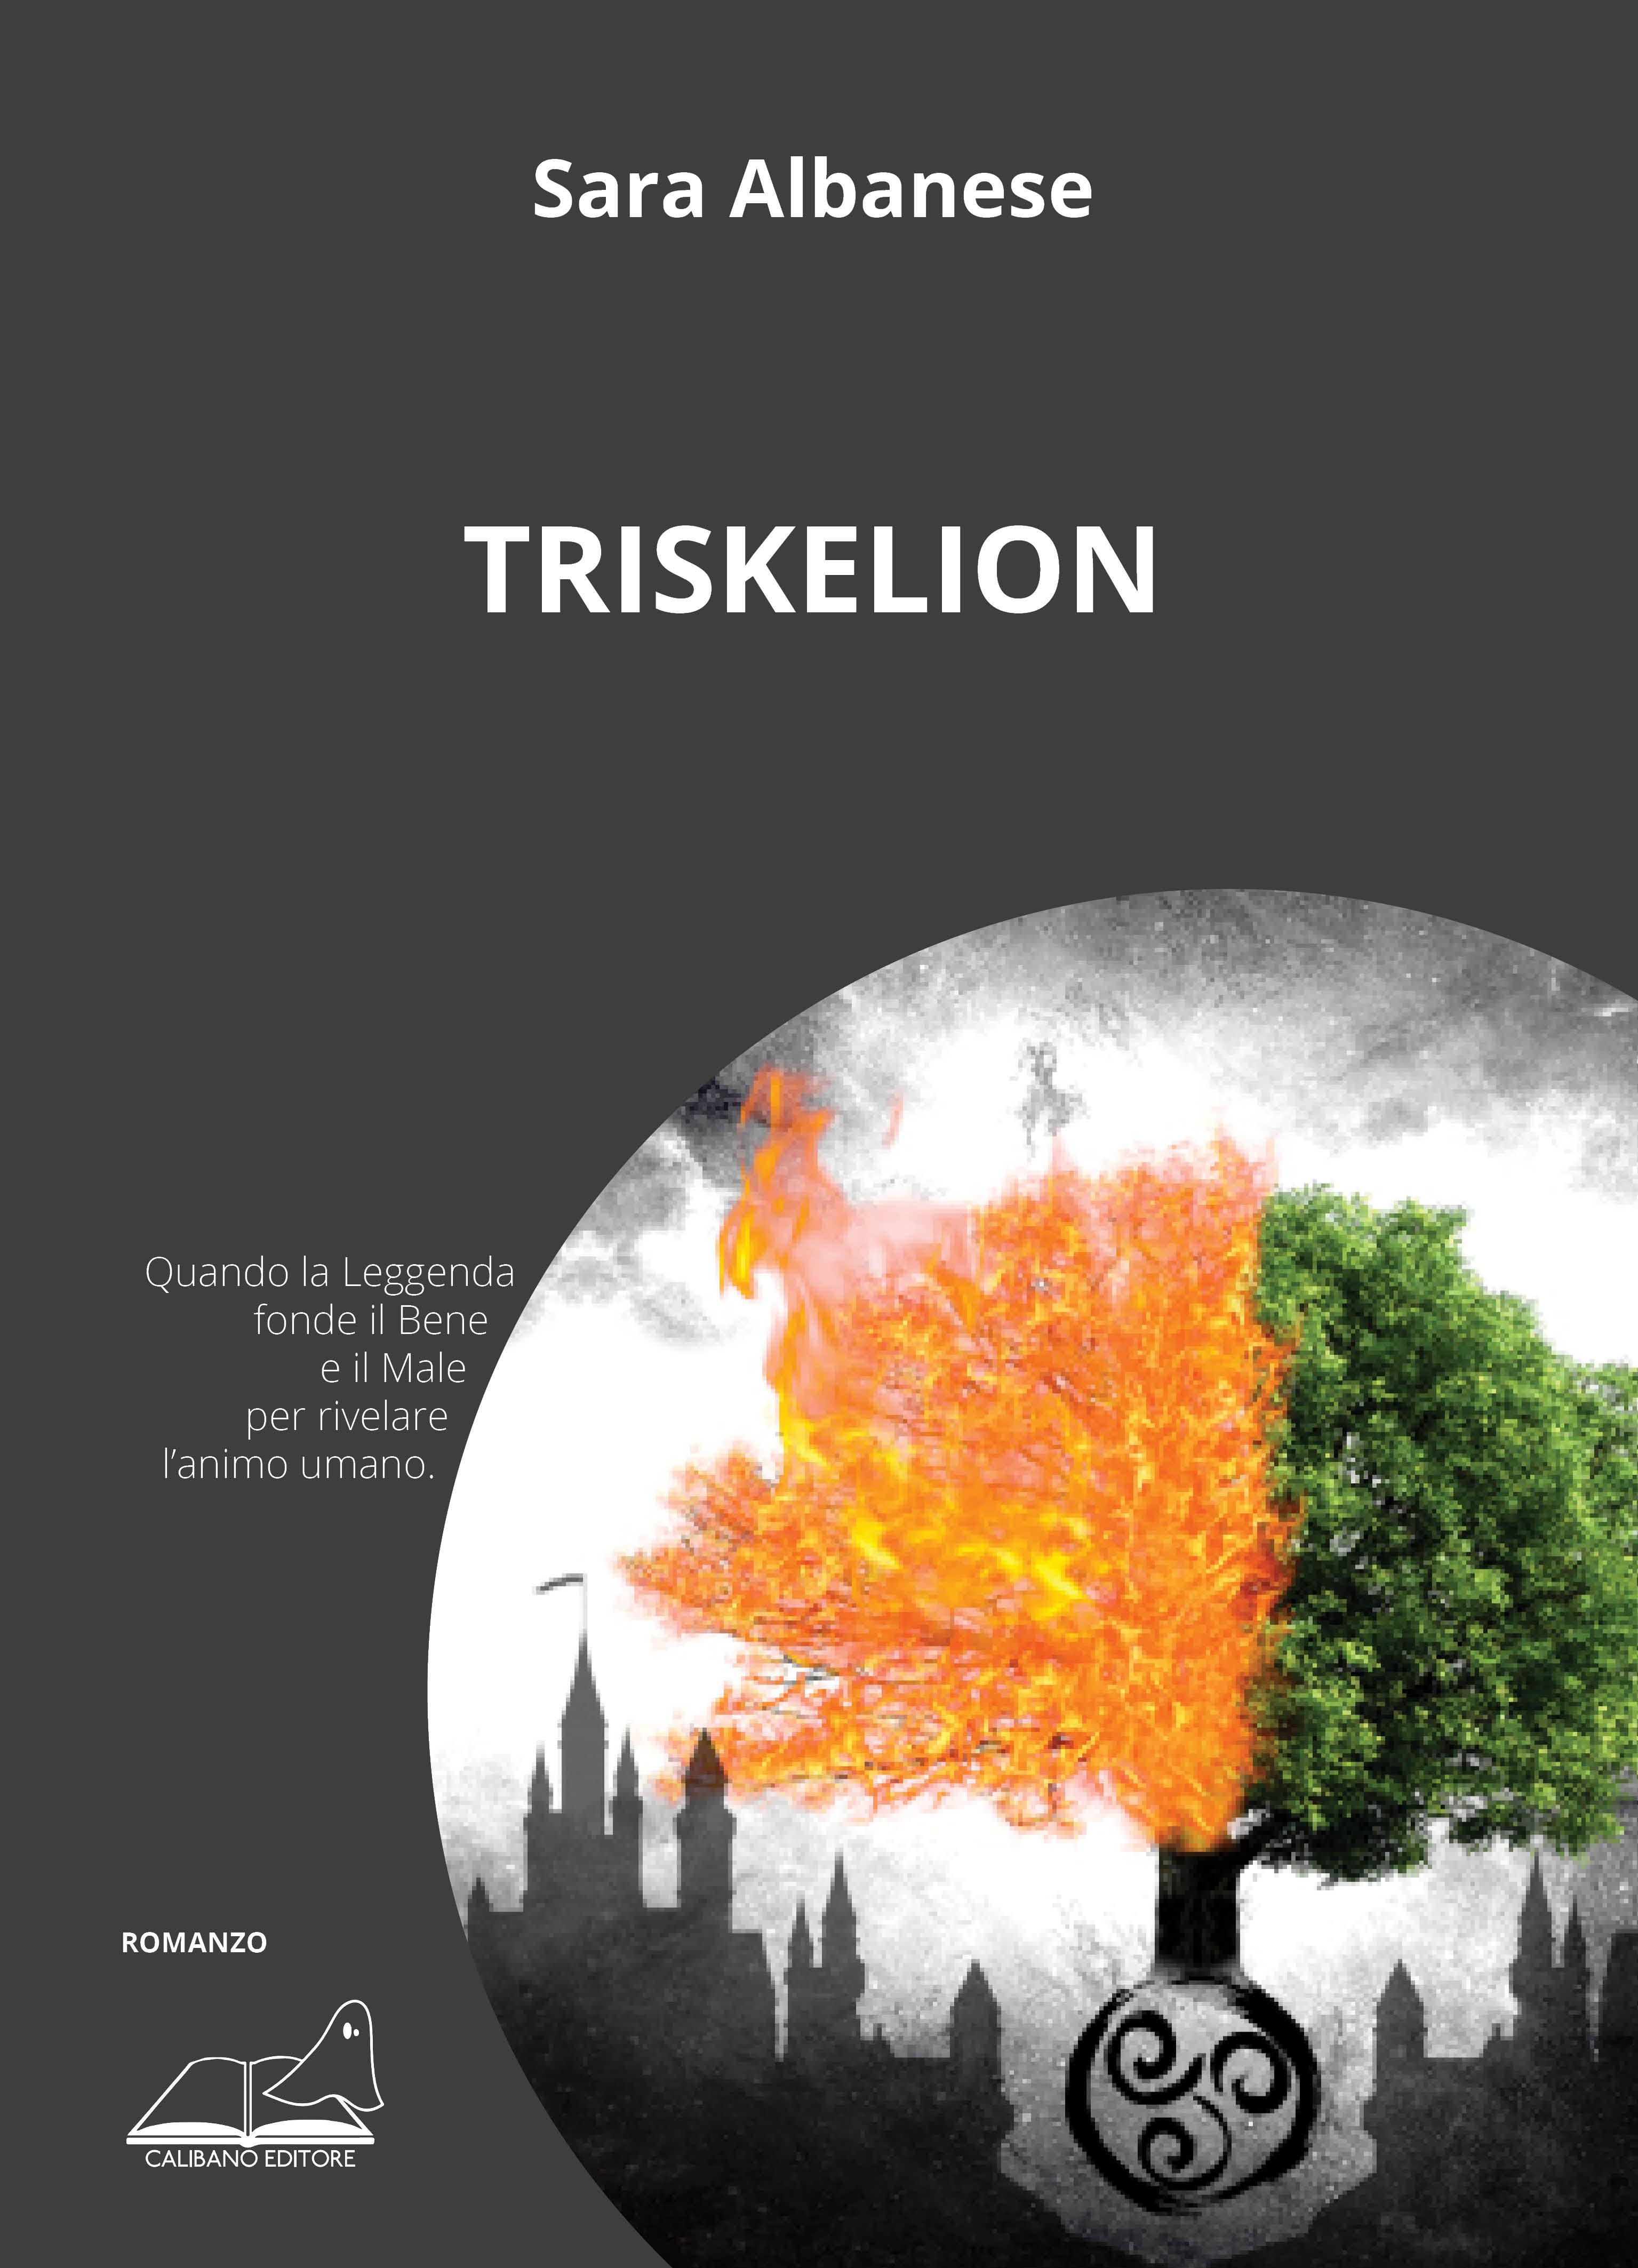 Triskelion-image-1%>